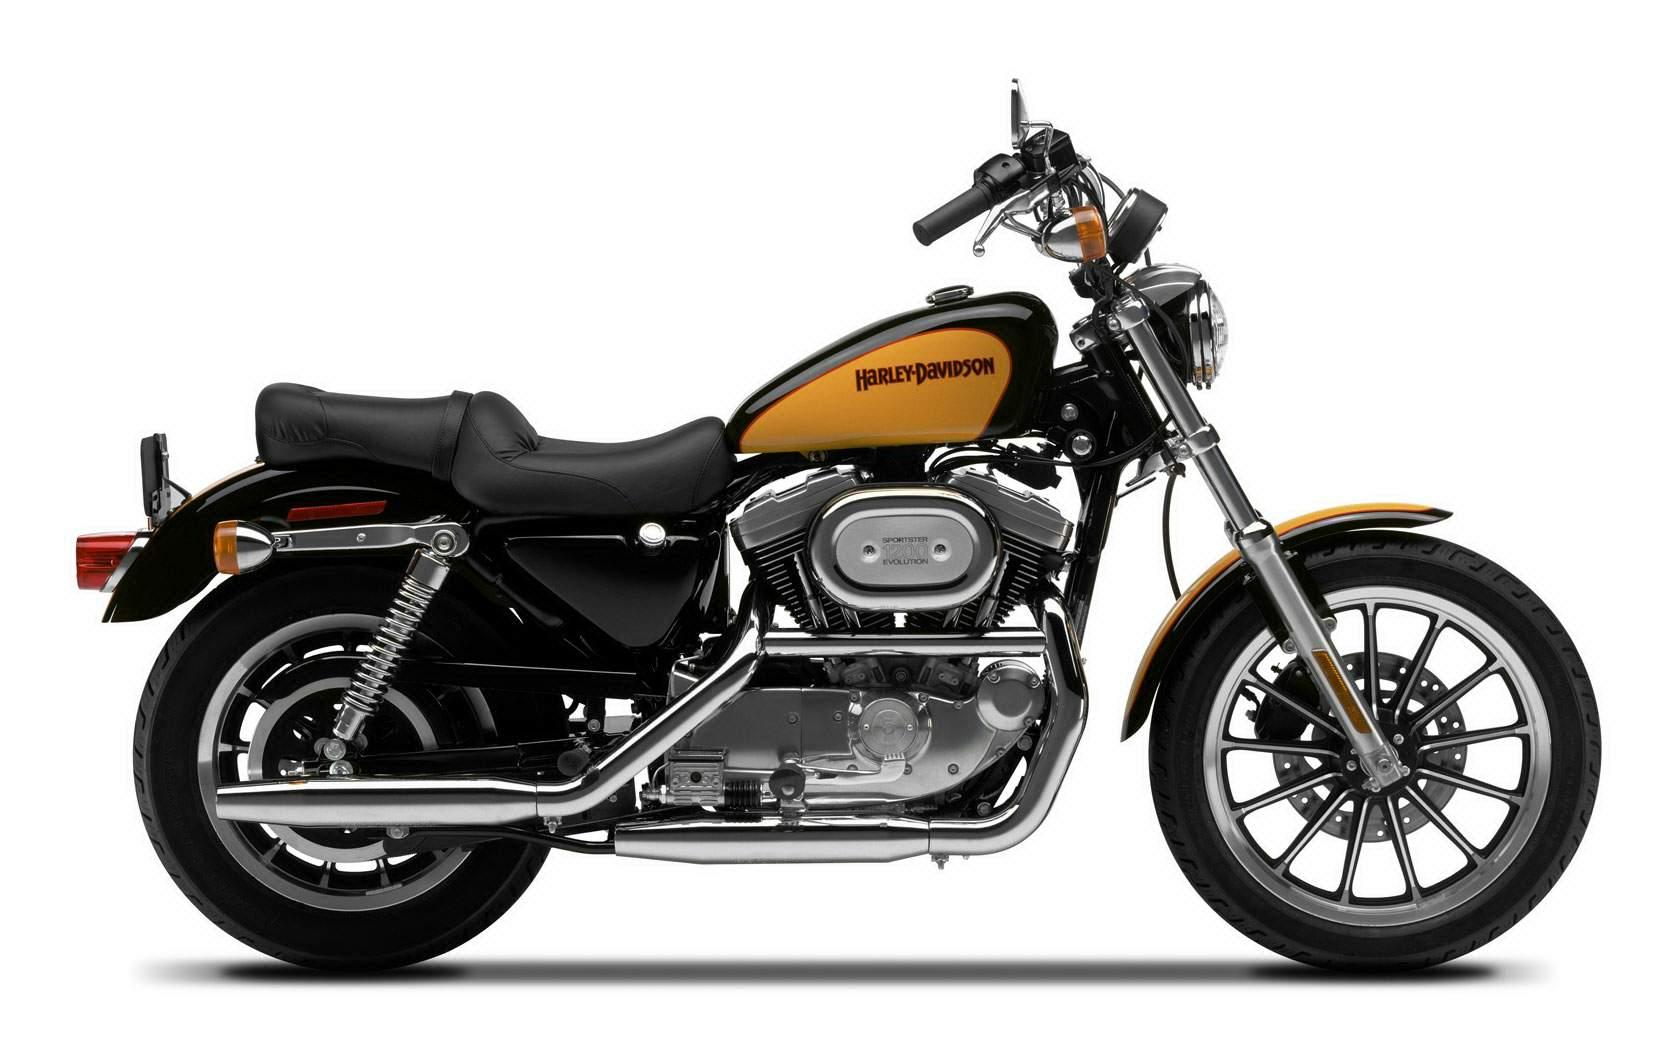 Harley Davidson Xlh 1200 Sportster